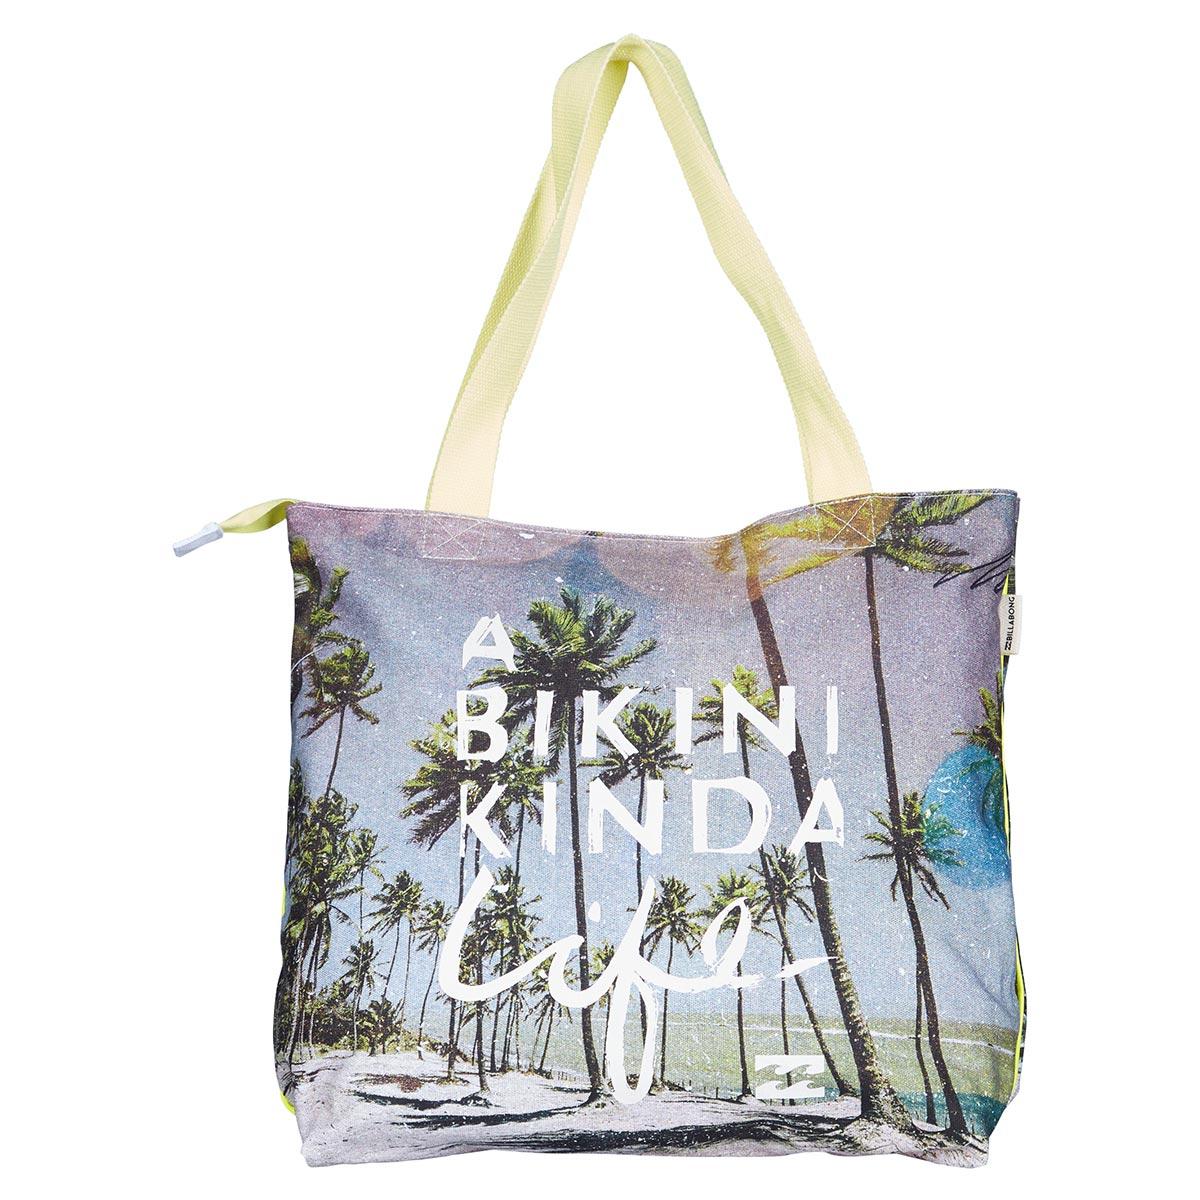 bunte strandtasche mit palmenfoto neue billabong kollektion. Black Bedroom Furniture Sets. Home Design Ideas